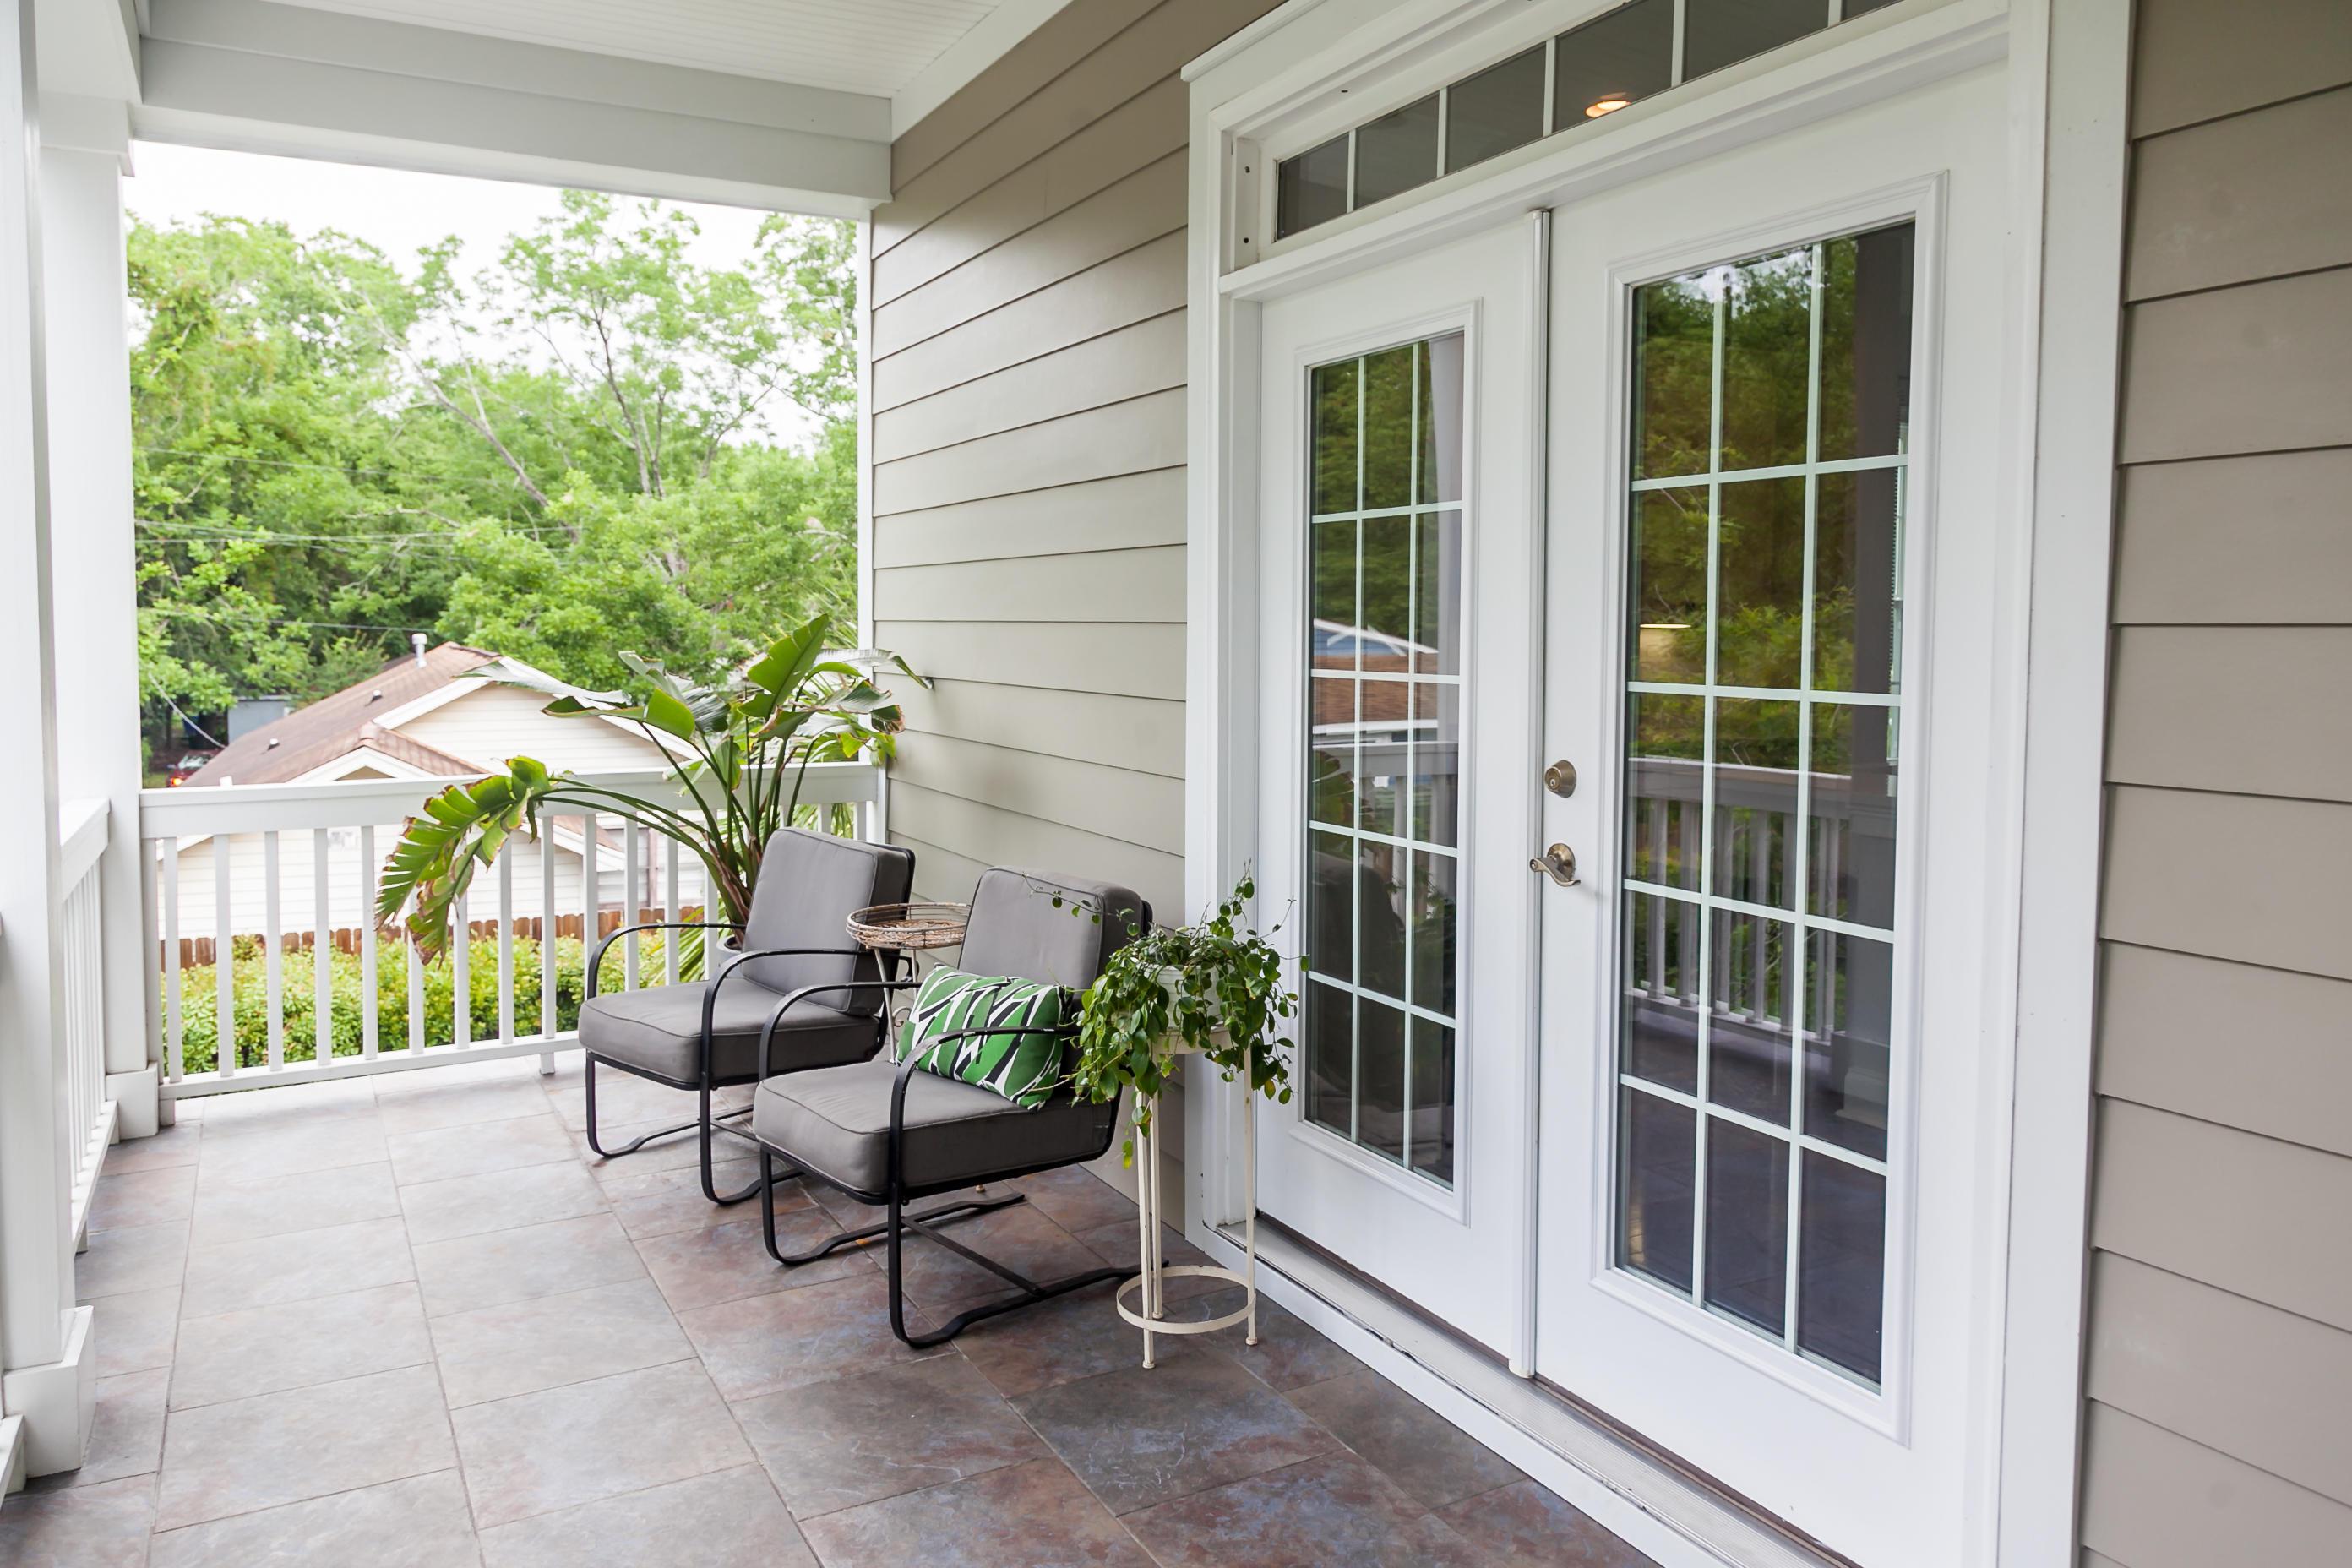 Whitesides Park Homes For Sale - 1319 Myrick, Mount Pleasant, SC - 43